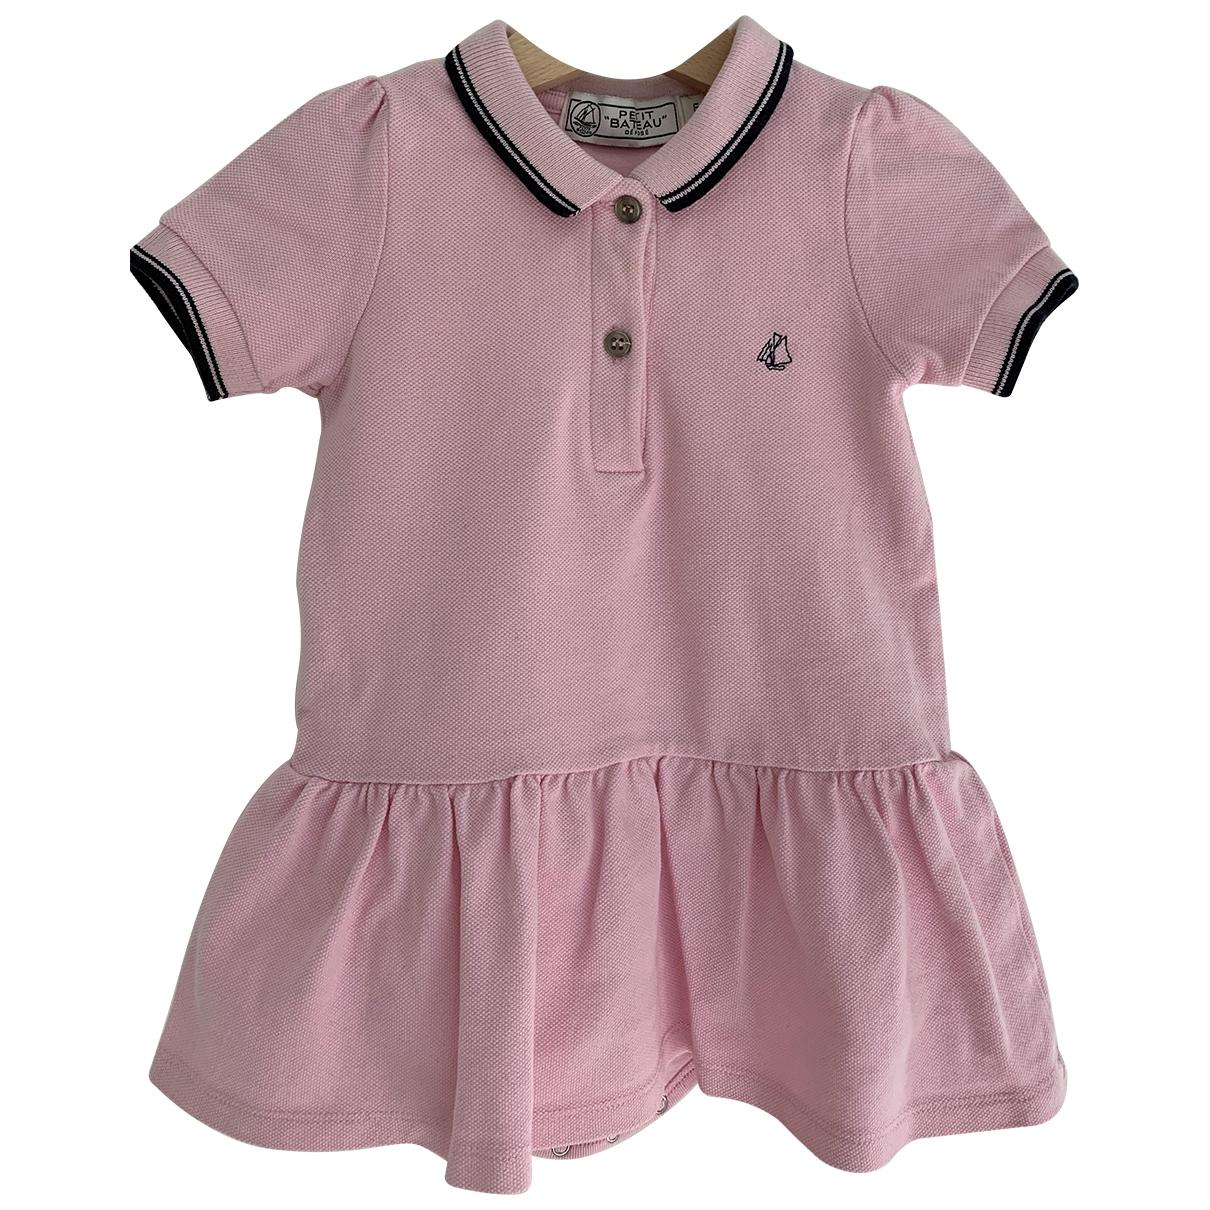 Petit Bateau \N Pink Cotton dress for Kids 18 months - up to 81cm FR